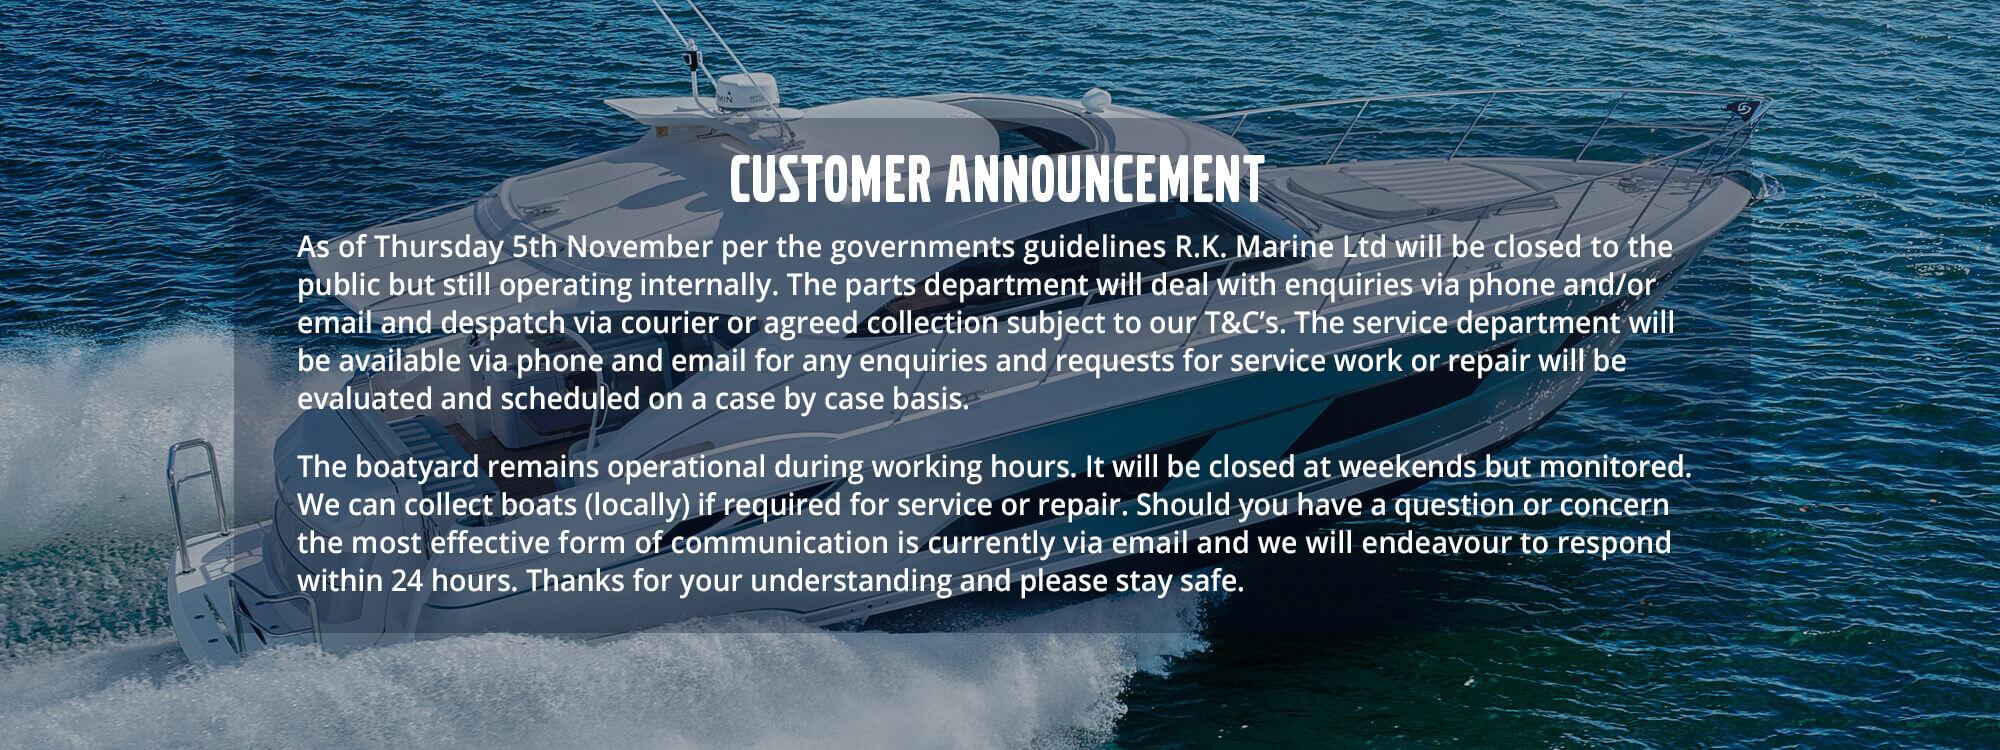 RK Marine Announcement November